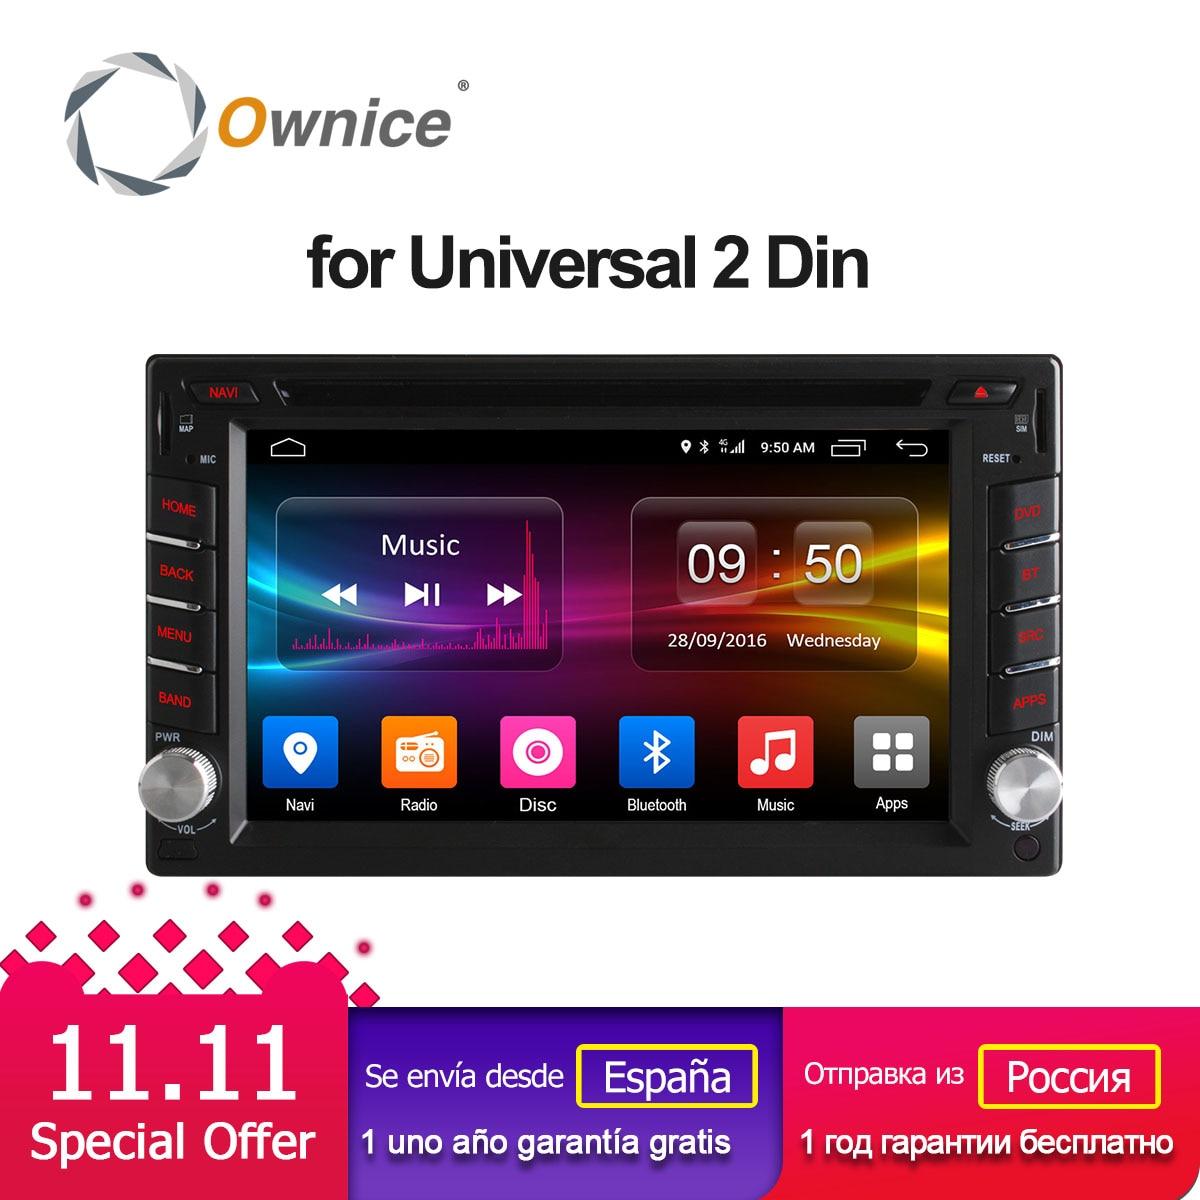 Ownice C500 Android 6.0 Octa 8 Core 2g di RAM 2 din car dvd Radio player GPS Navi Video Monitor per universale BT 4g SIM Rete LTE